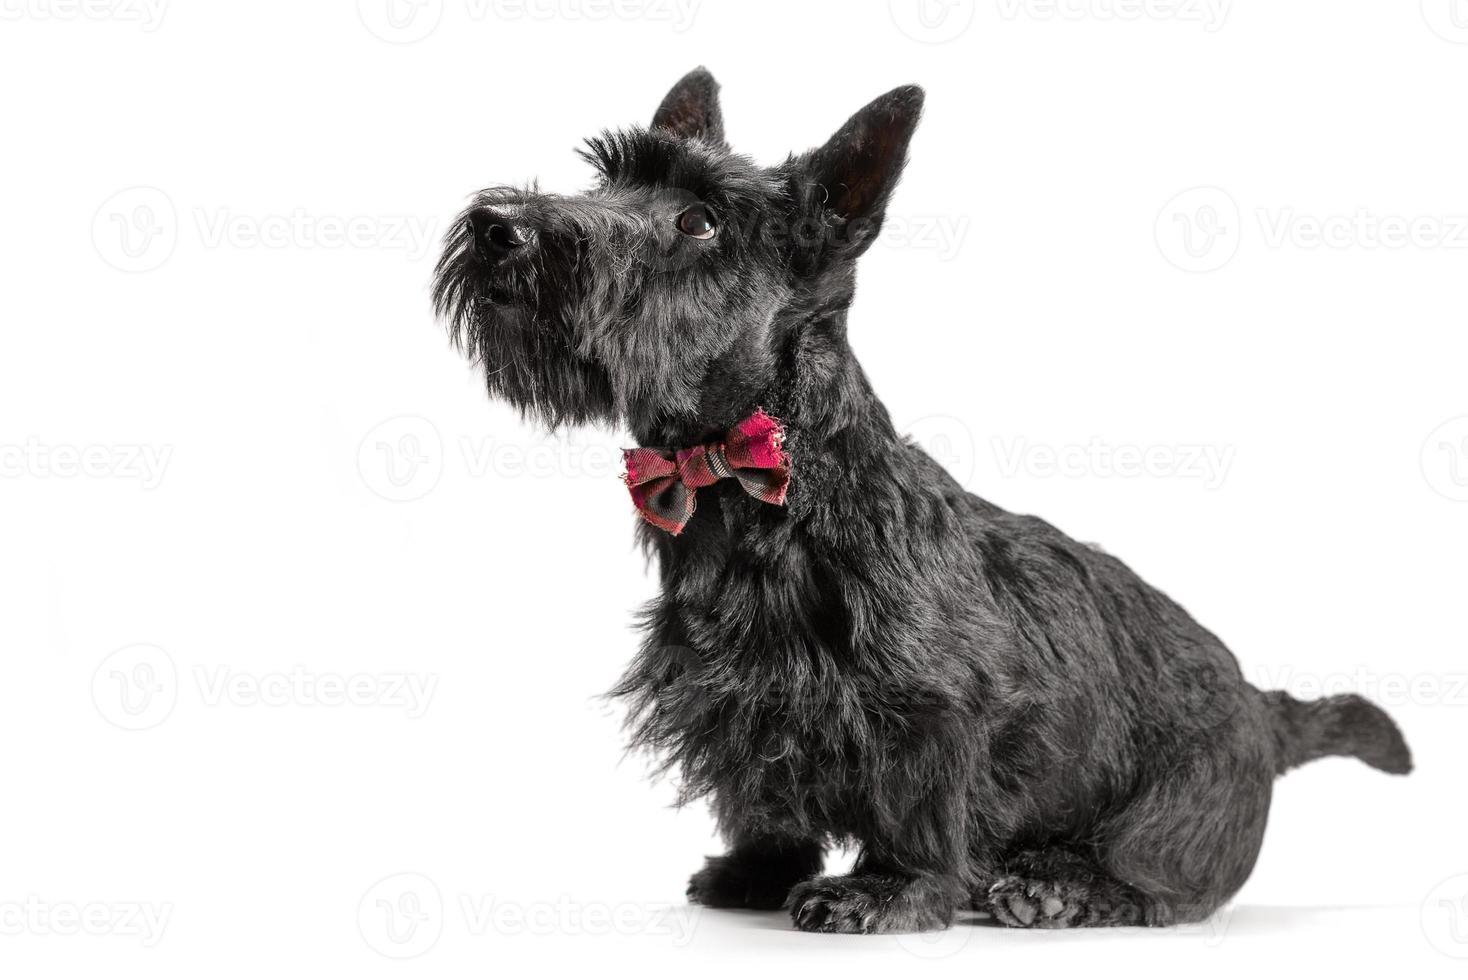 black scottish terrier puppy on a white background photo